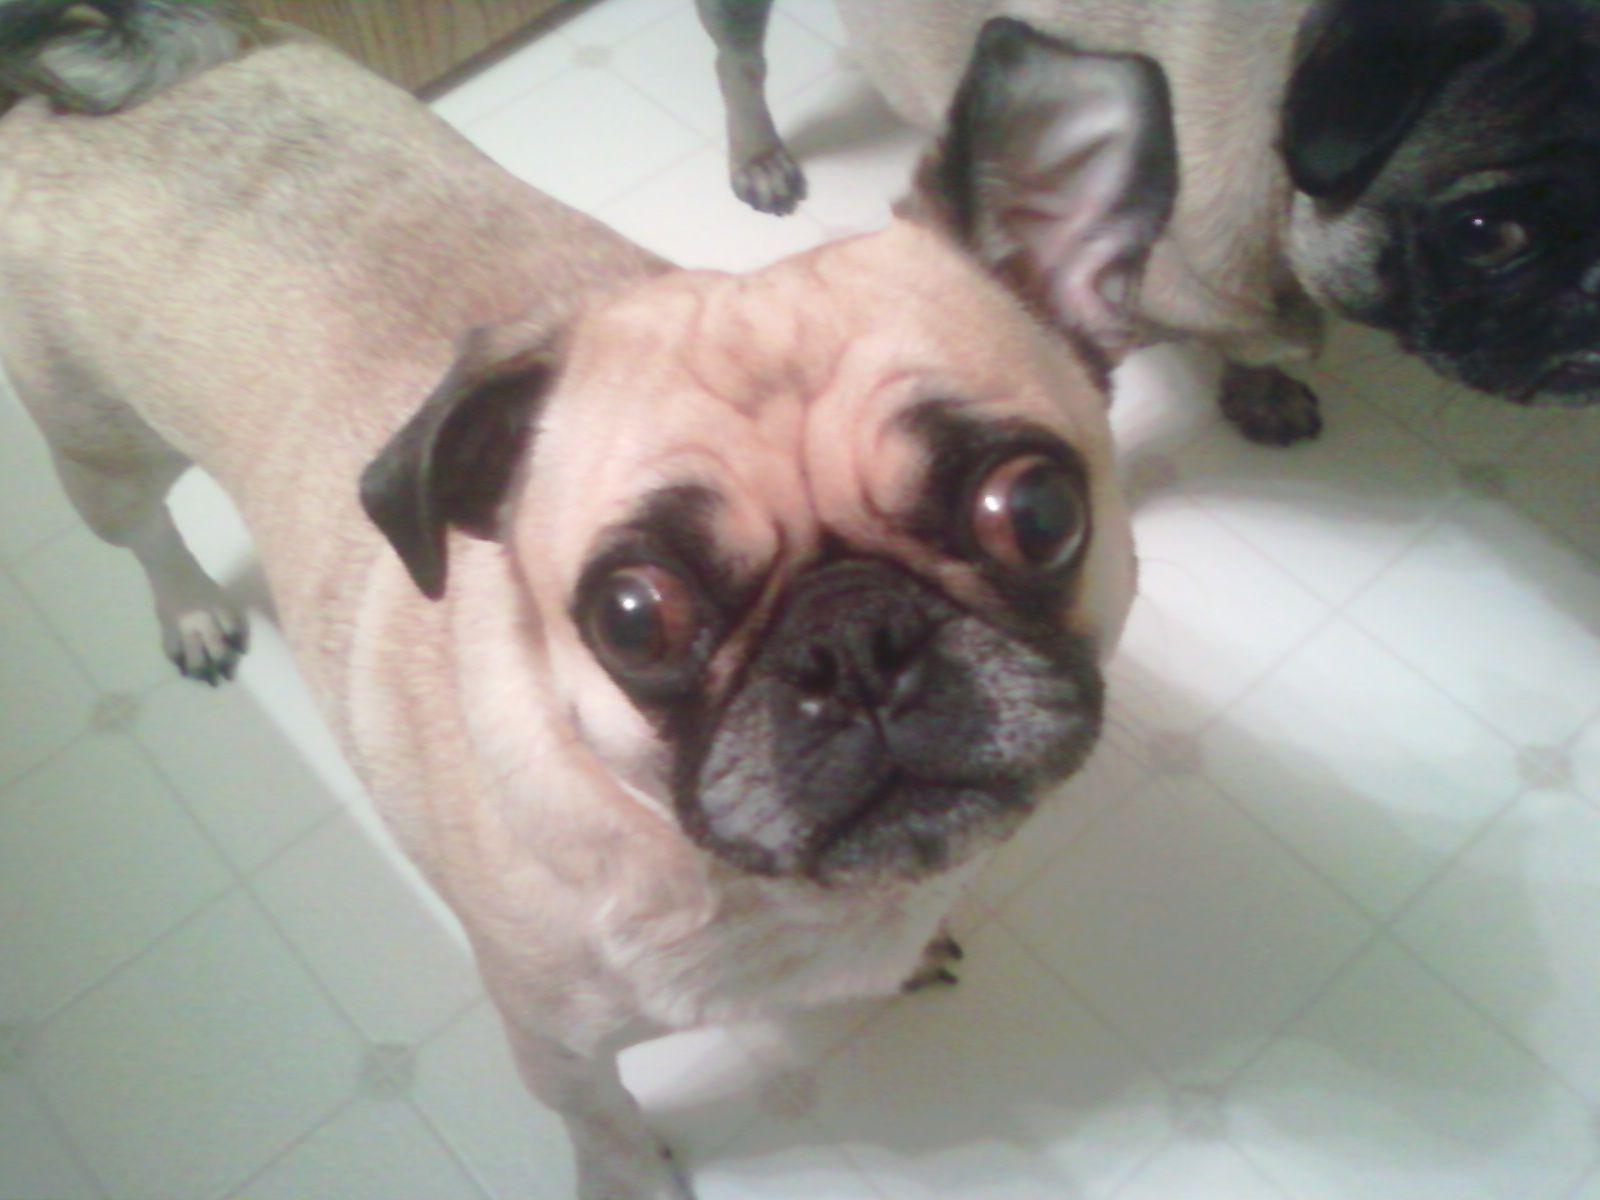 Pug - I hear you!